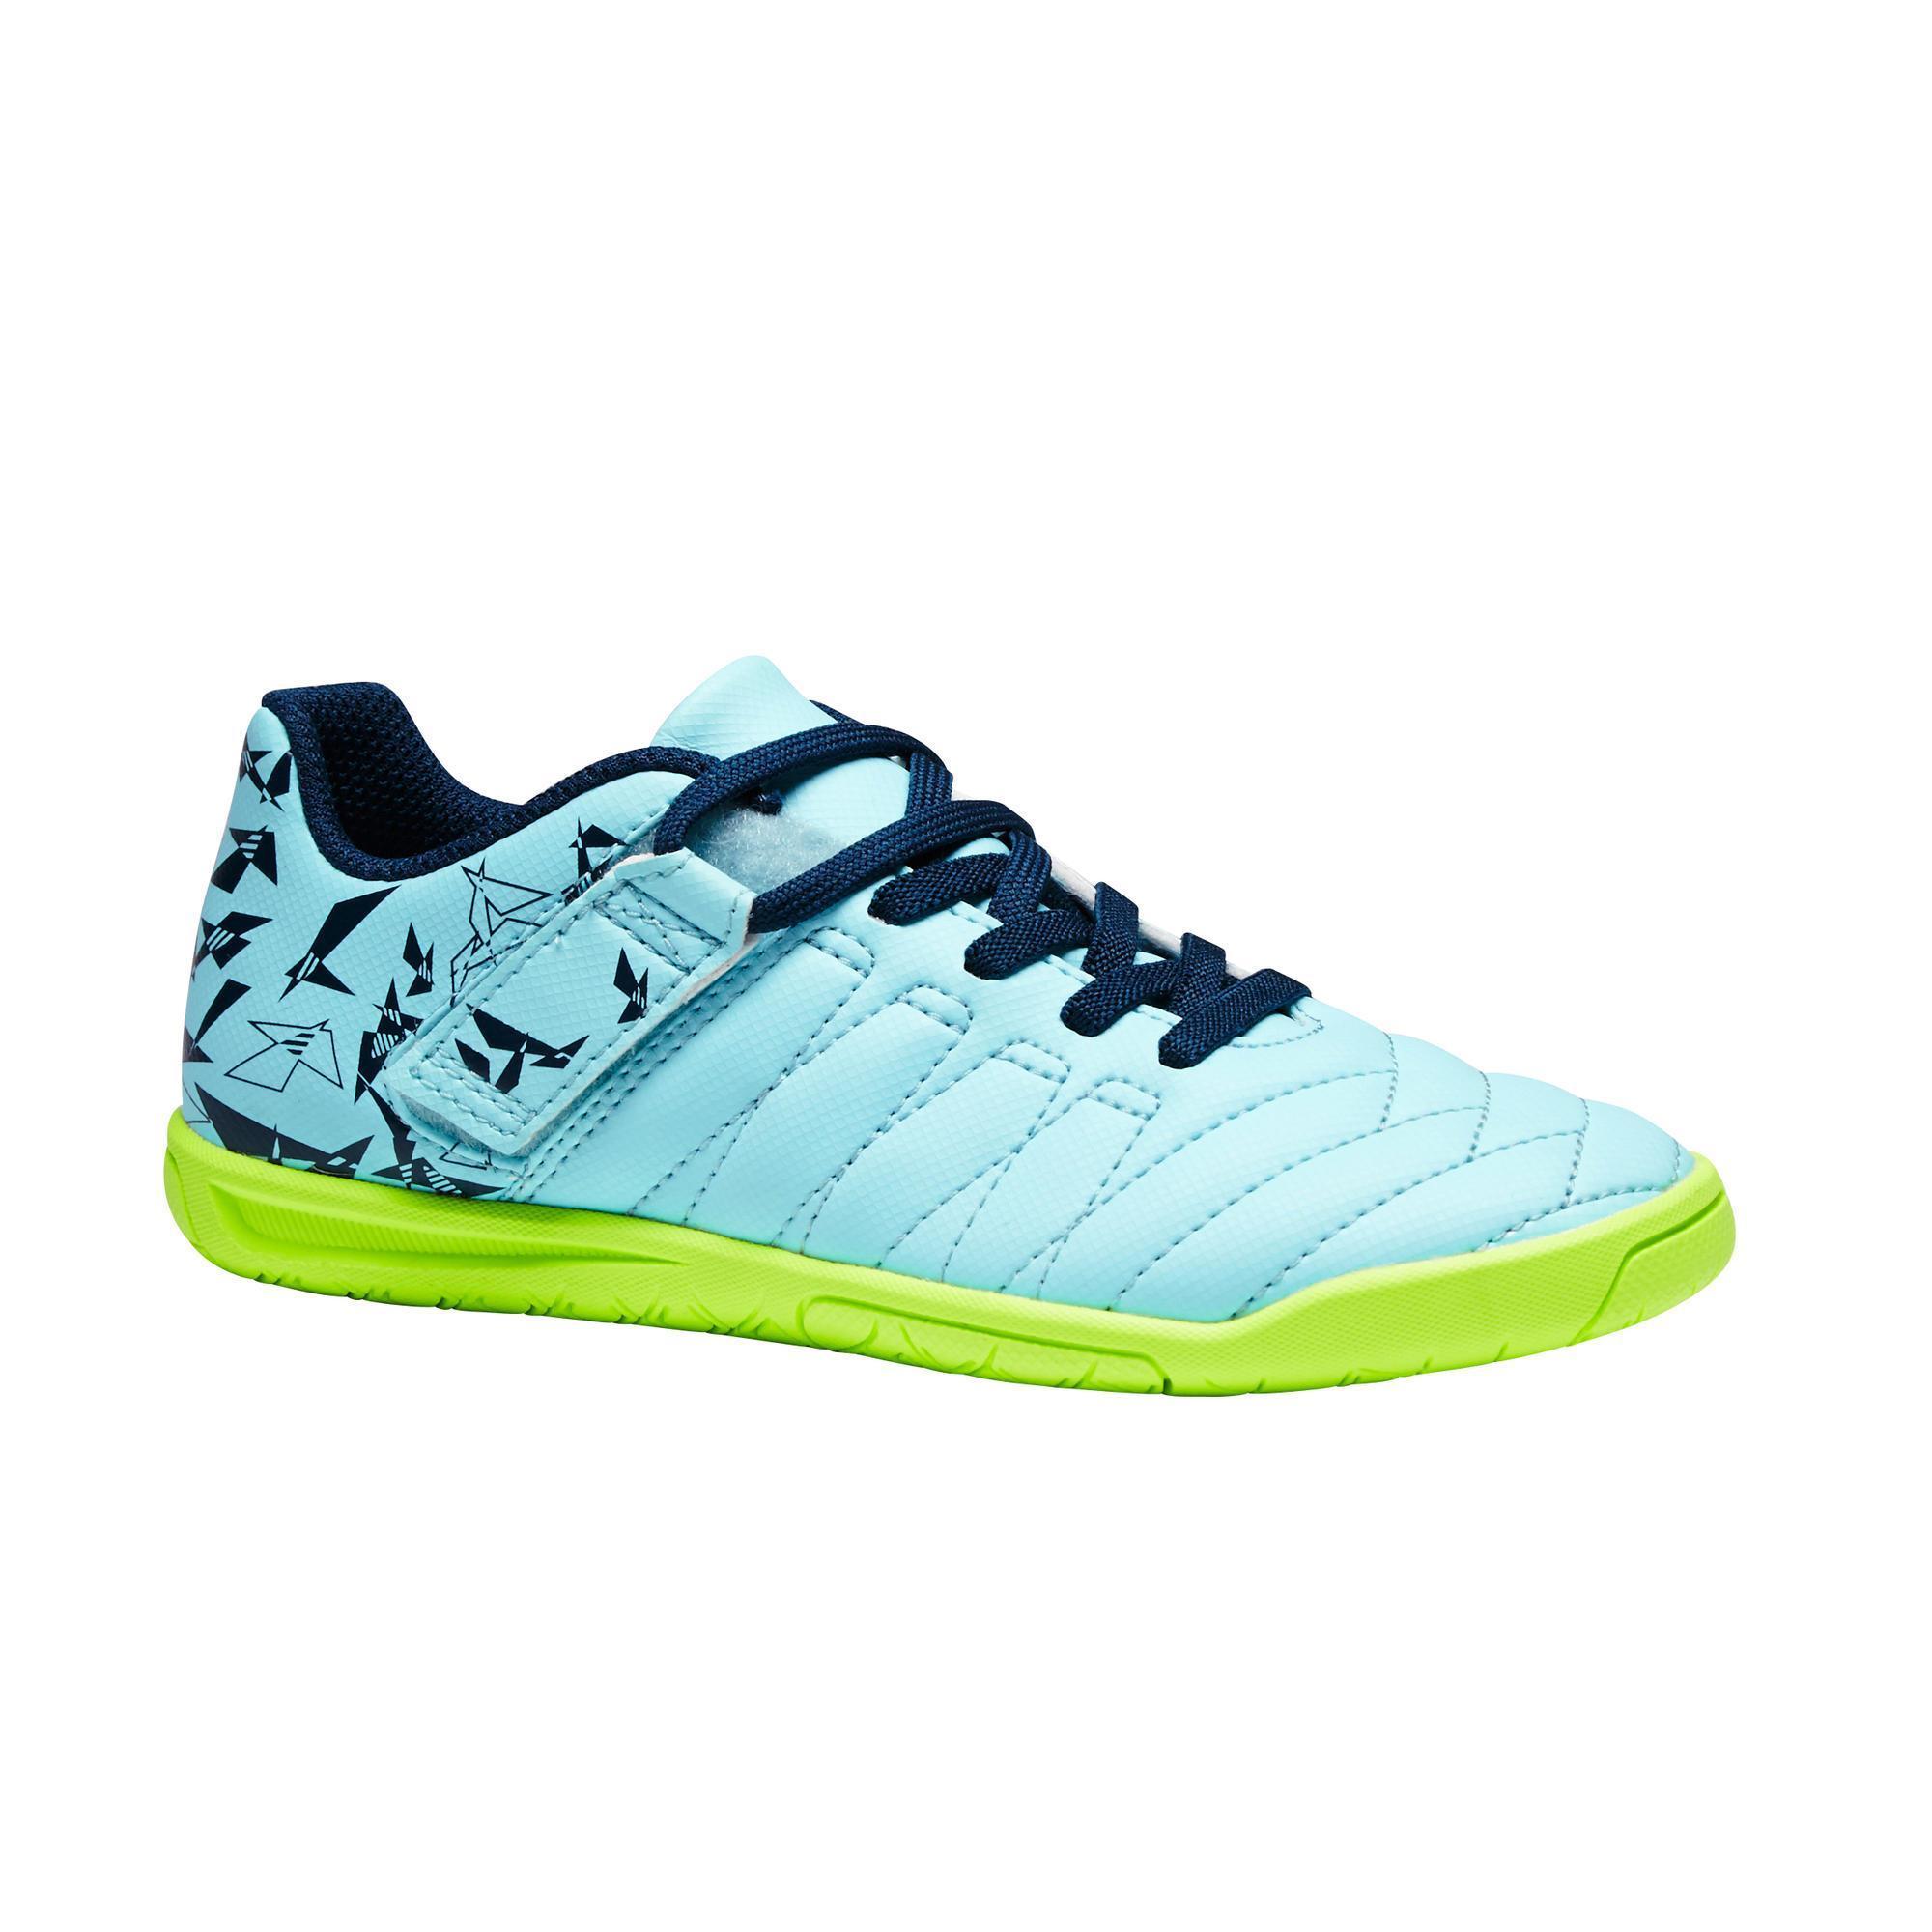 Kipsta Zaalvoetbalschoenen kind CLR 500 sala klittenband blauw